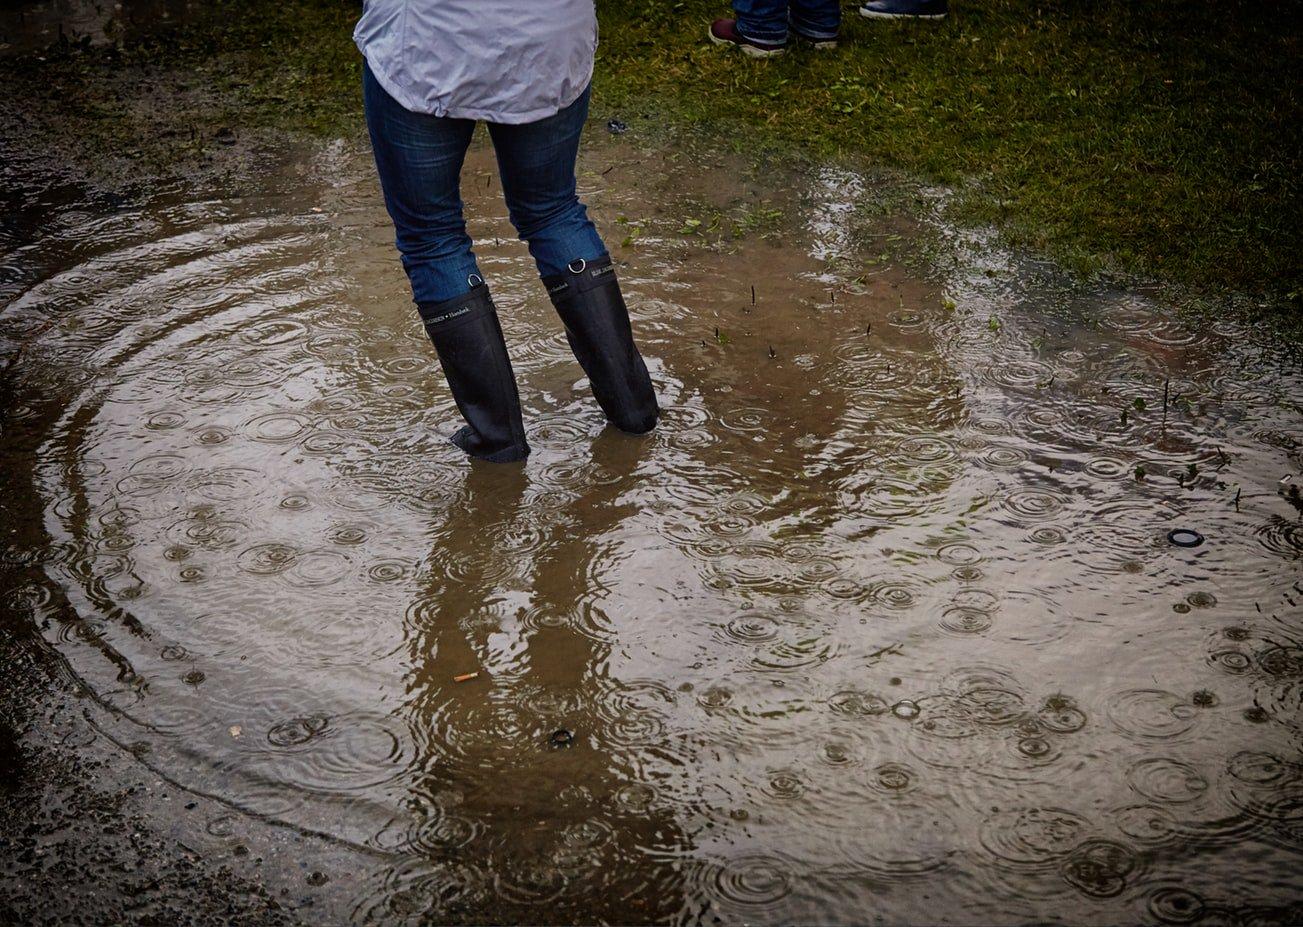 Затоп от дождя в лесу картинки